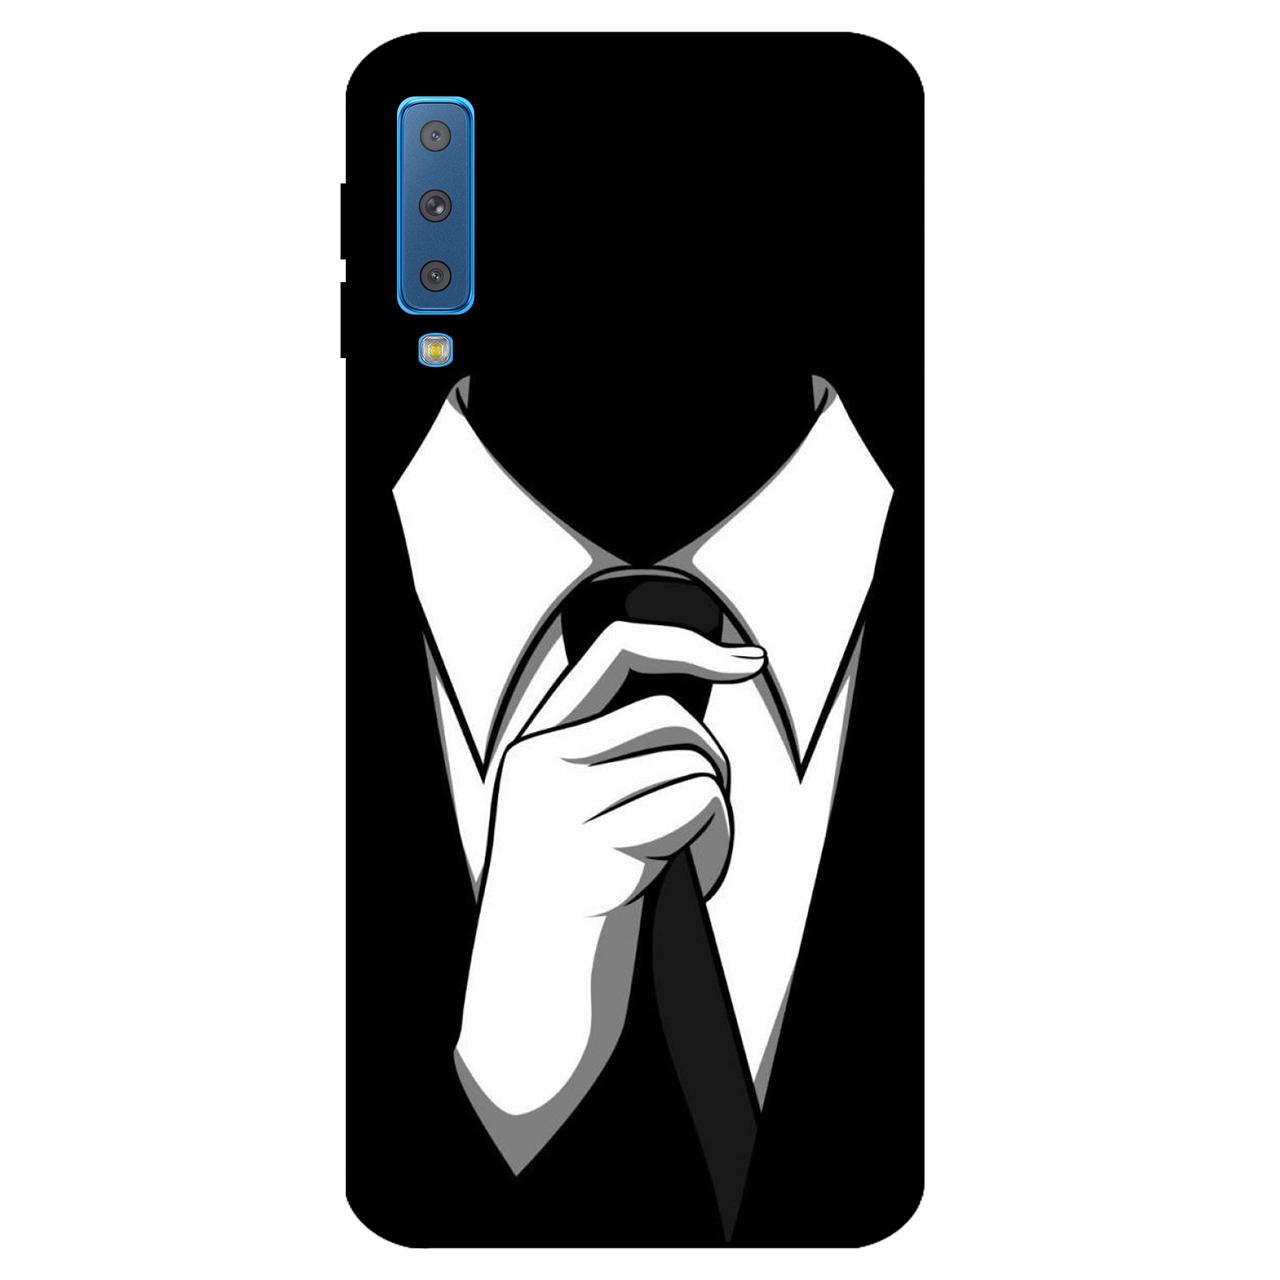 کاور کی اچ مدل 7131 مناسب برای گوشی موبایل سامسونگ A750 - A7 2018